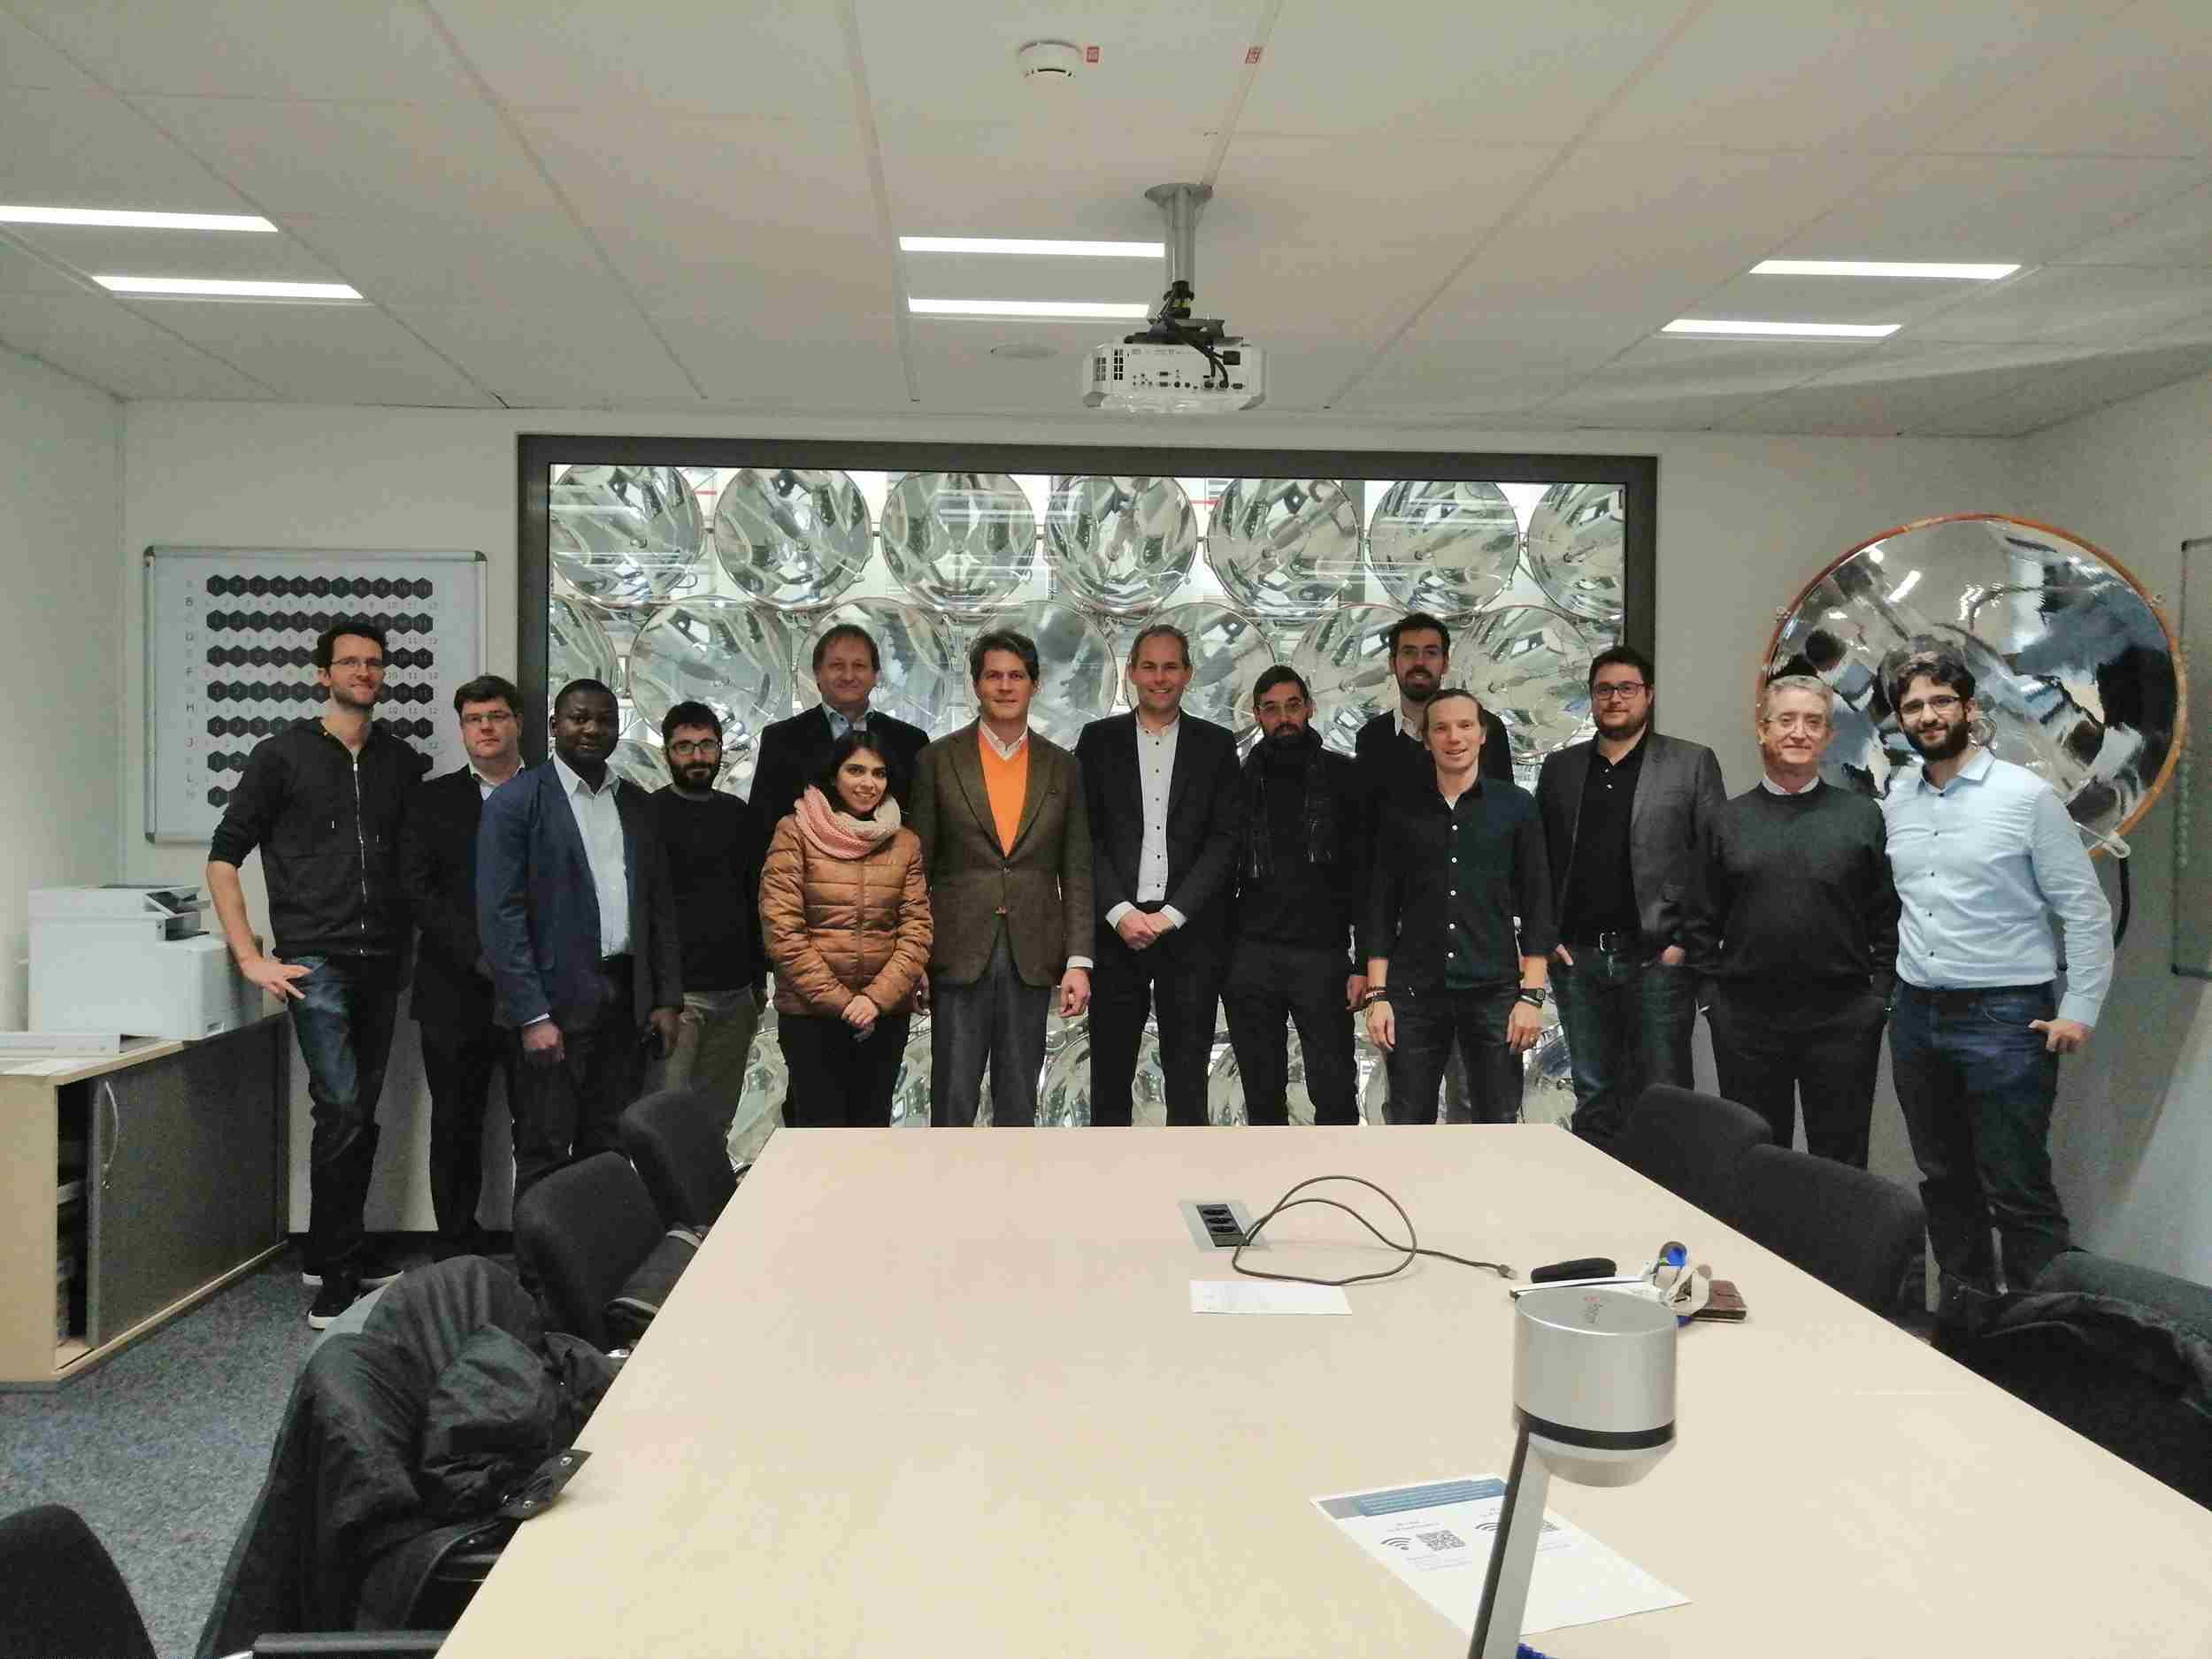 Members of the SUN-to-LIQUID project consortium